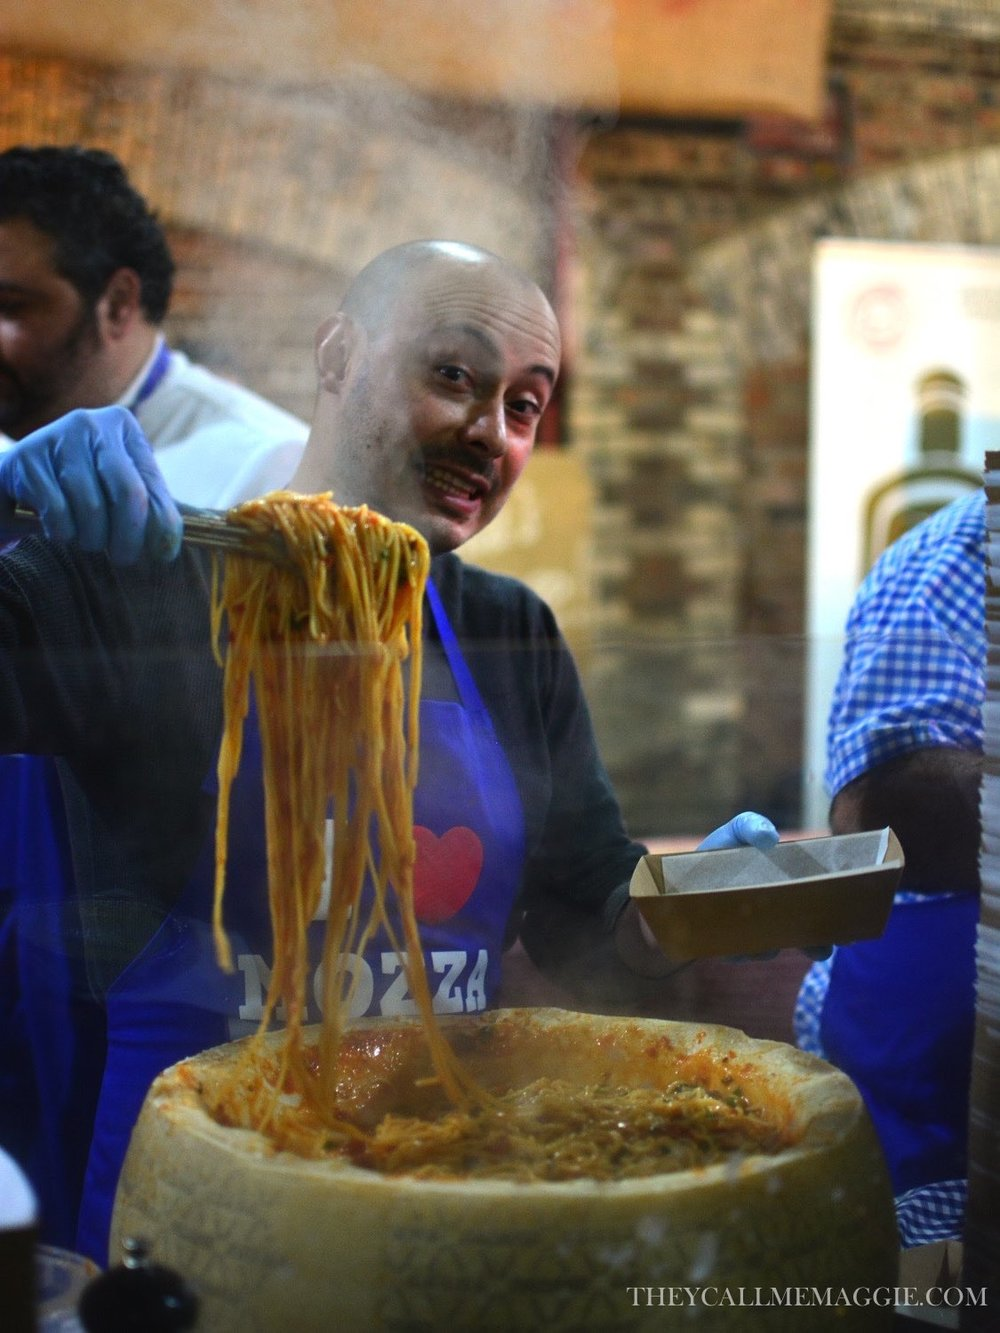 mozzarella-bar-qvm.jpg